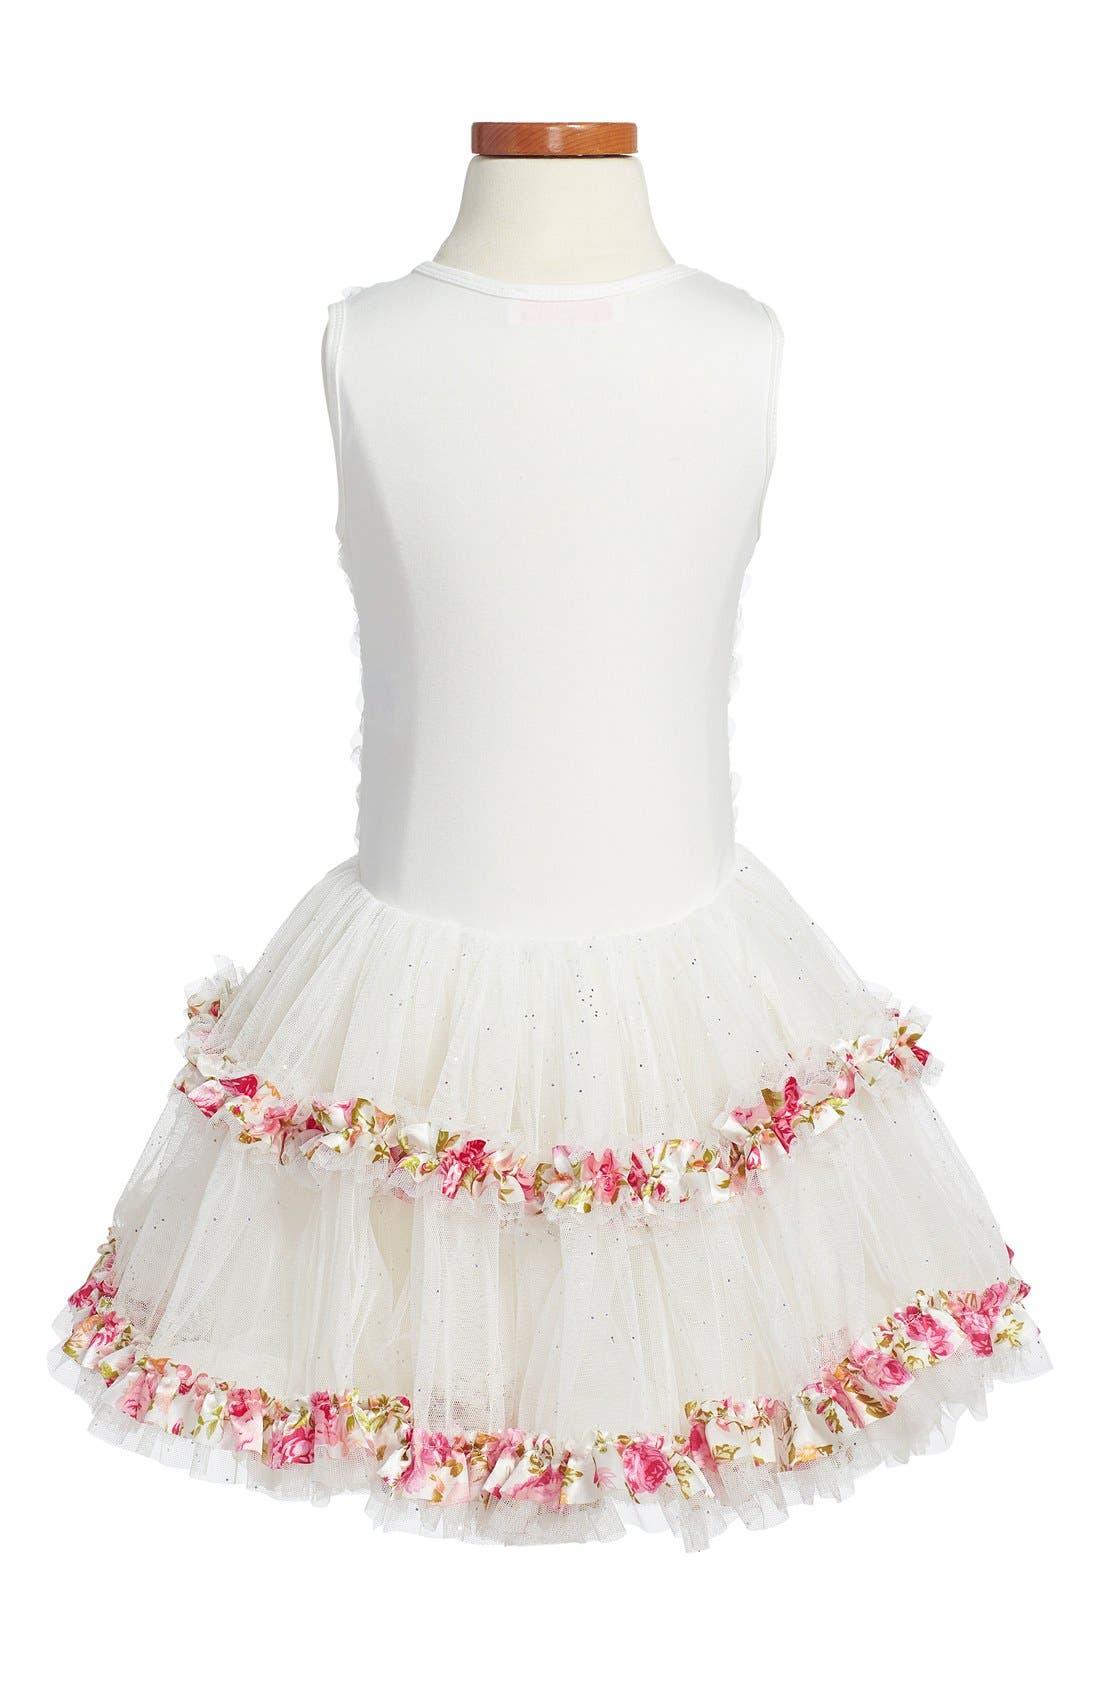 Petticoat Skirt Tank Dress,                             Alternate thumbnail 2, color,                             110